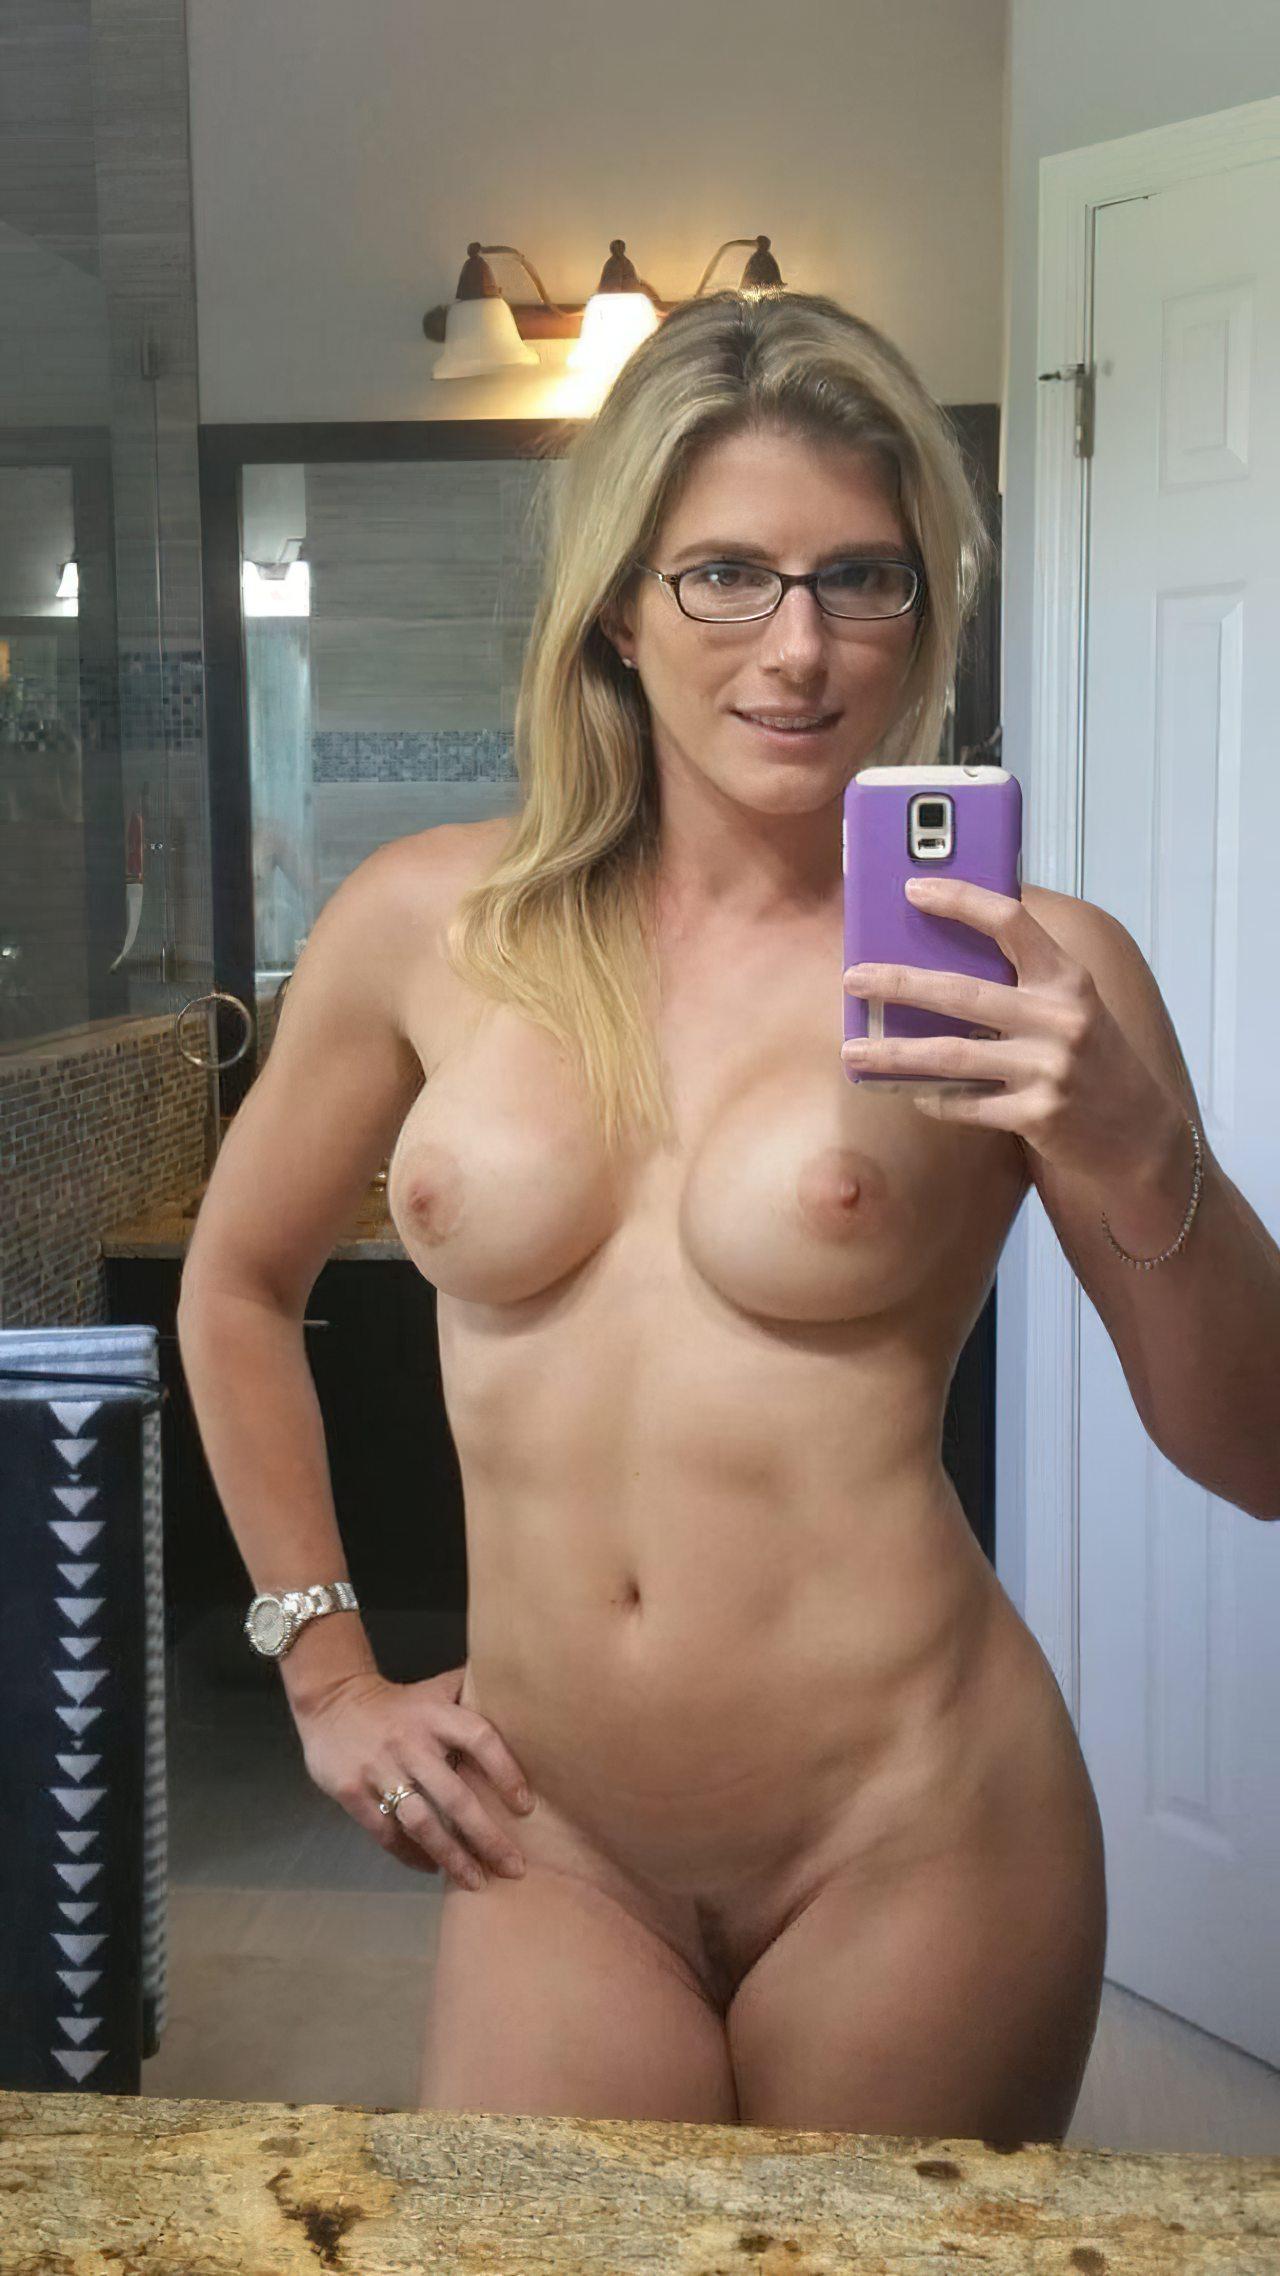 Fotos de Mulheres Despidas (4)